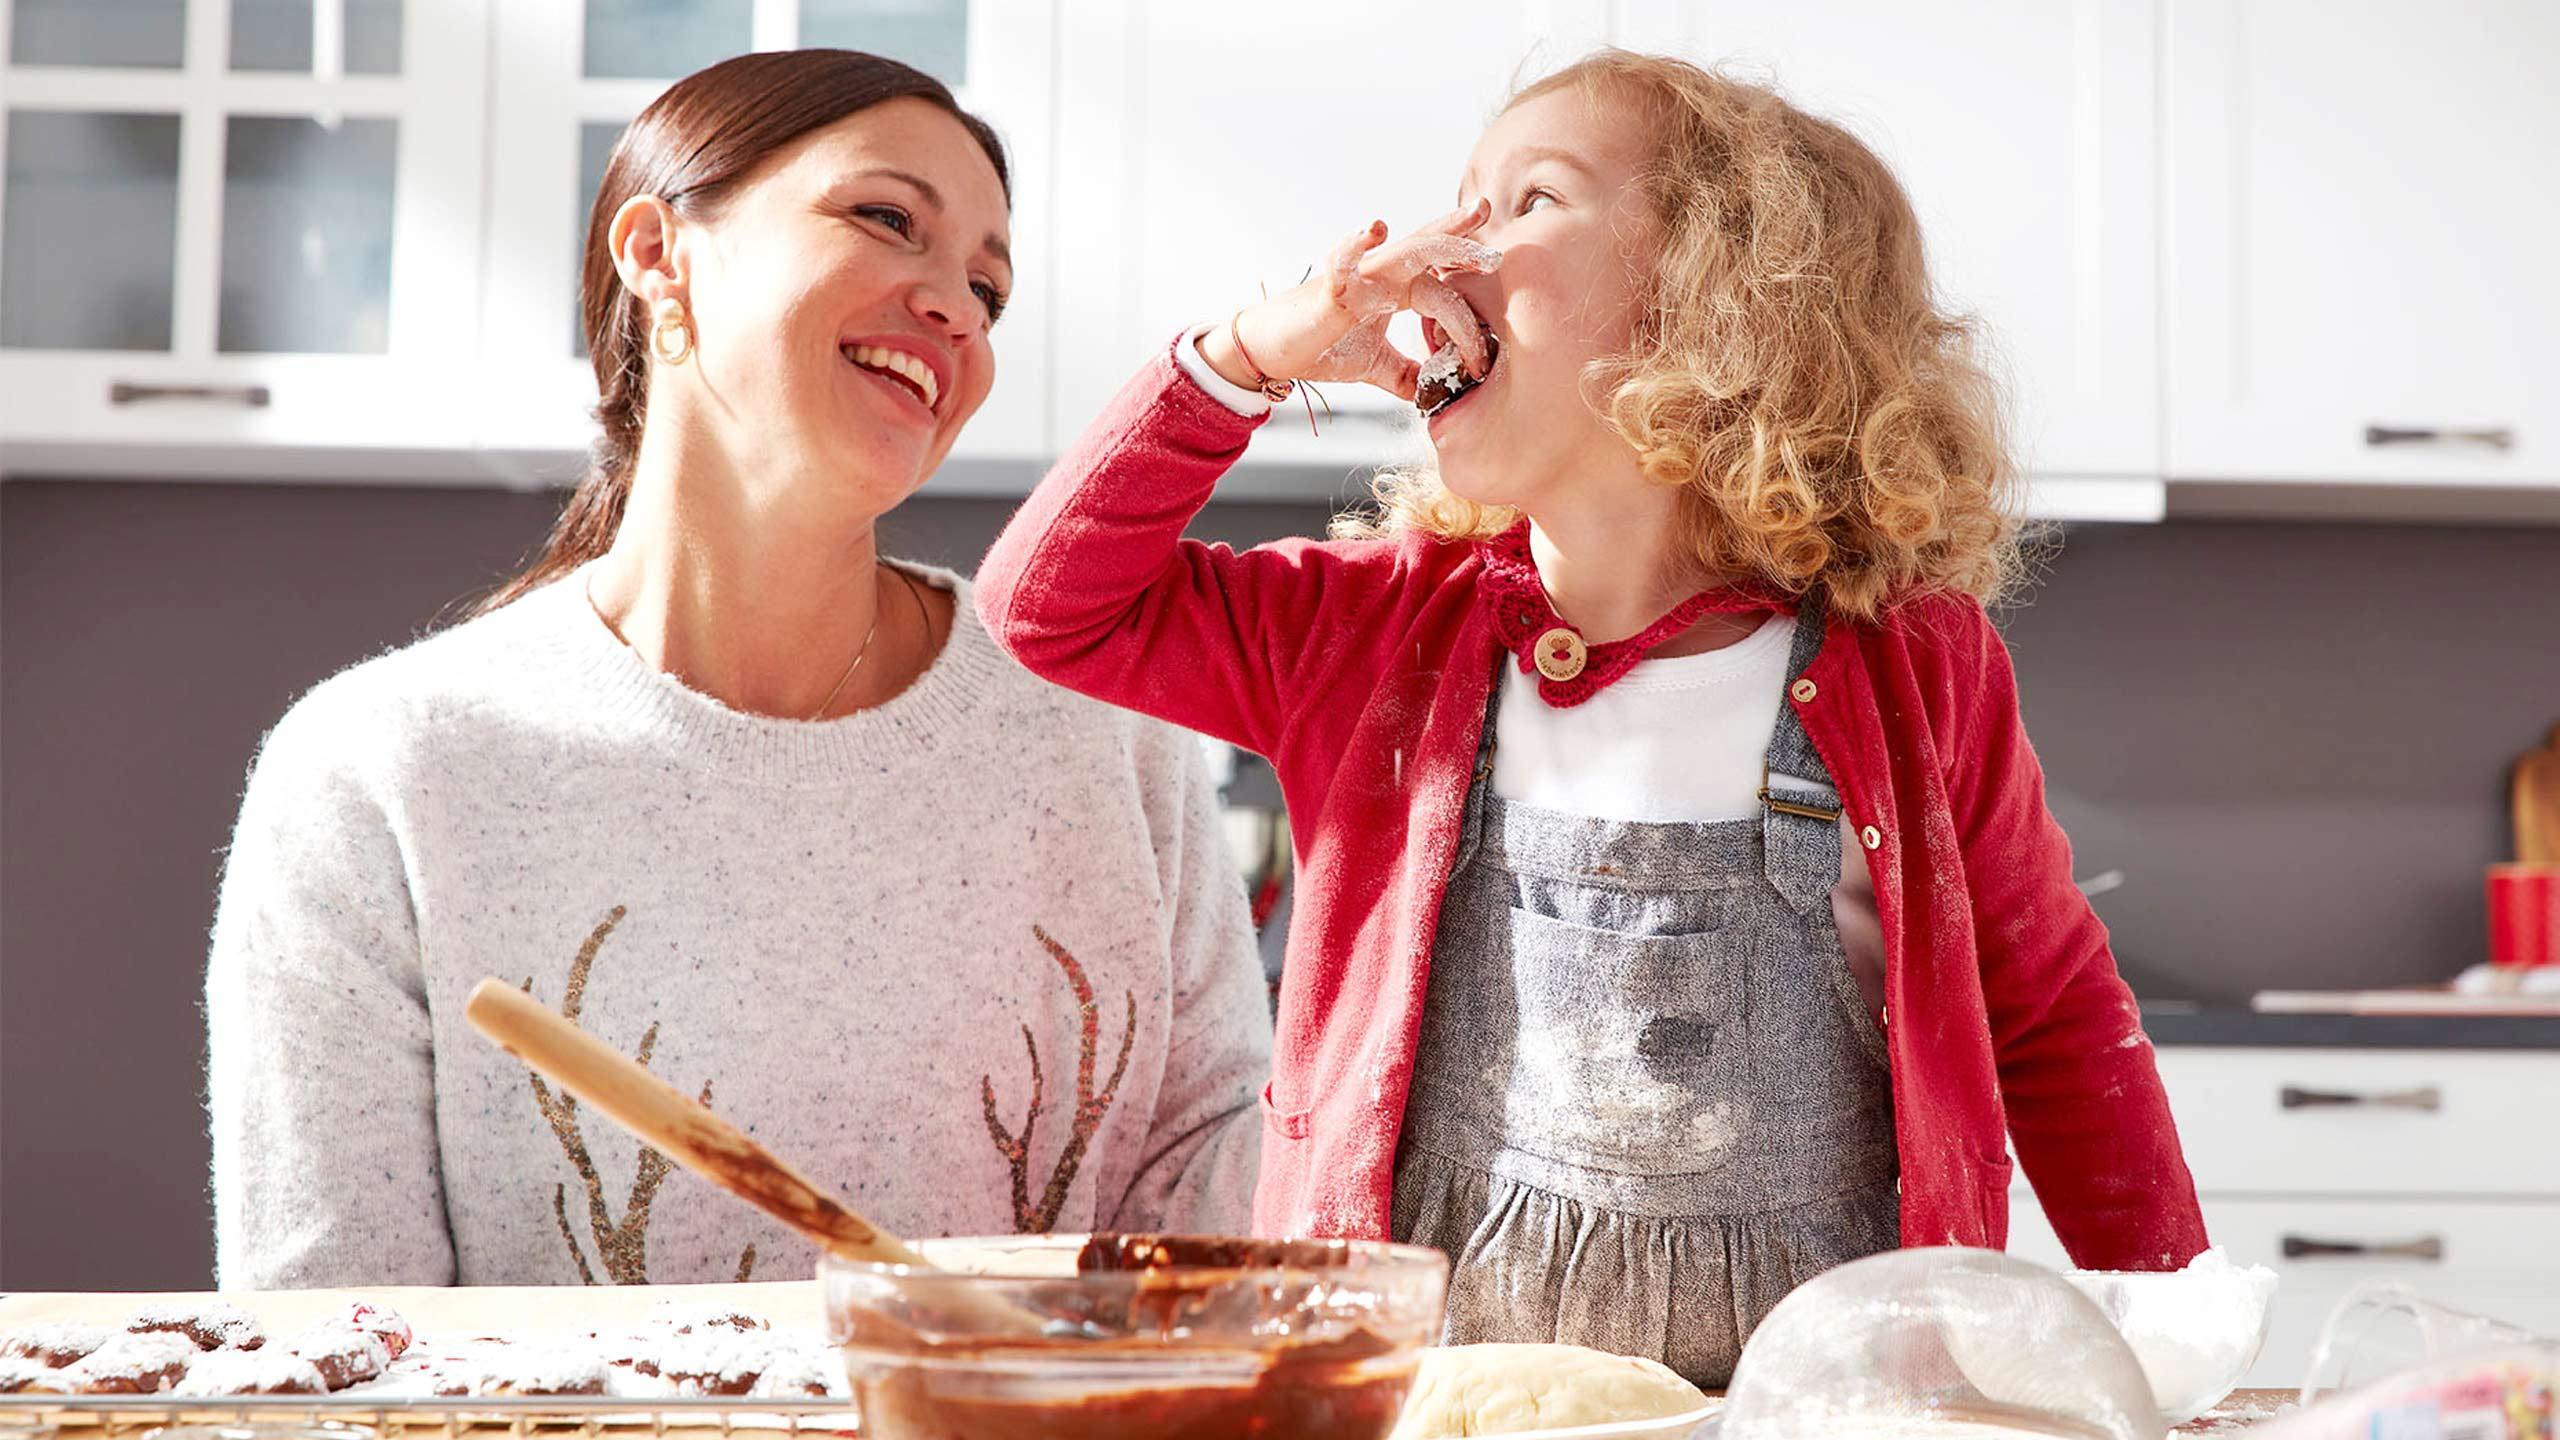 Frau Kind Plätzchen backen Küche